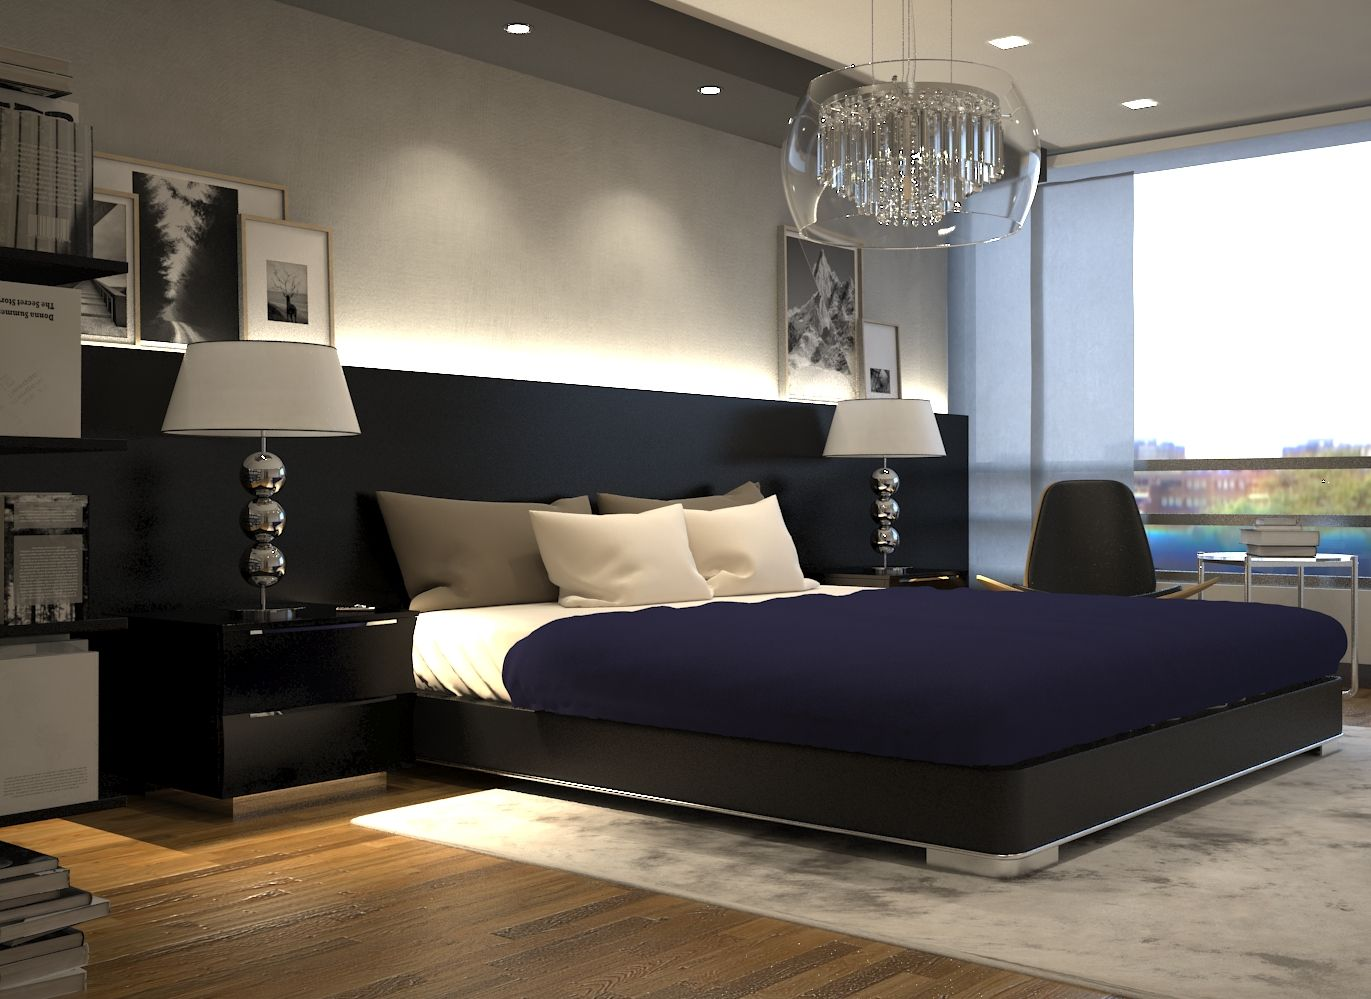 dise o interior dormitorio principal moderno contemporaneo